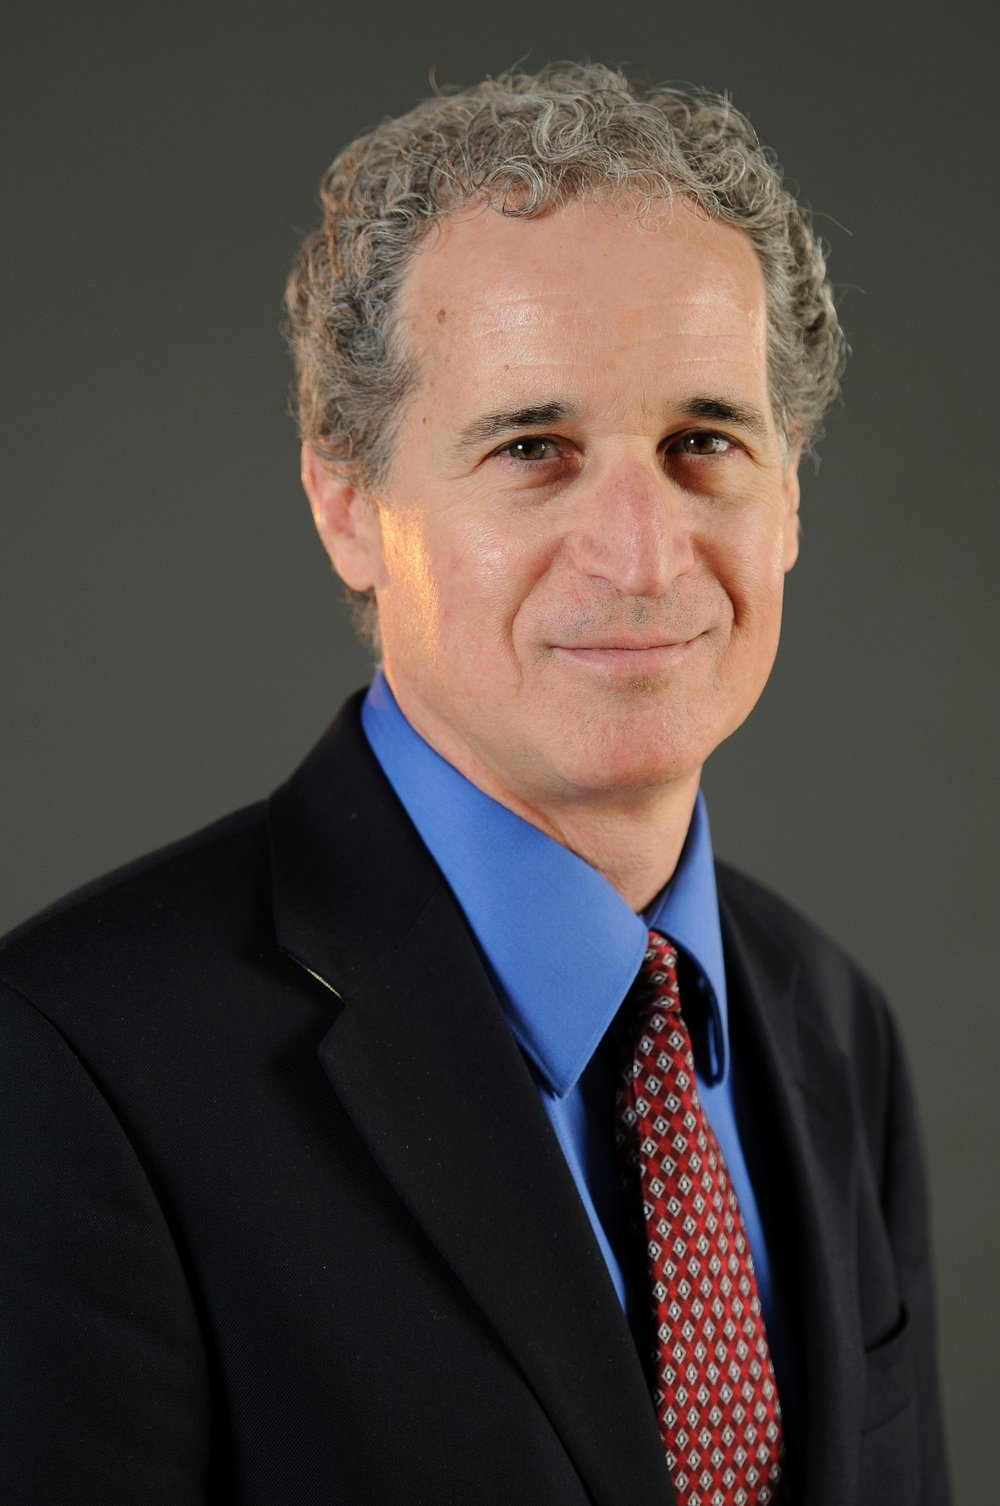 Brian Mittman